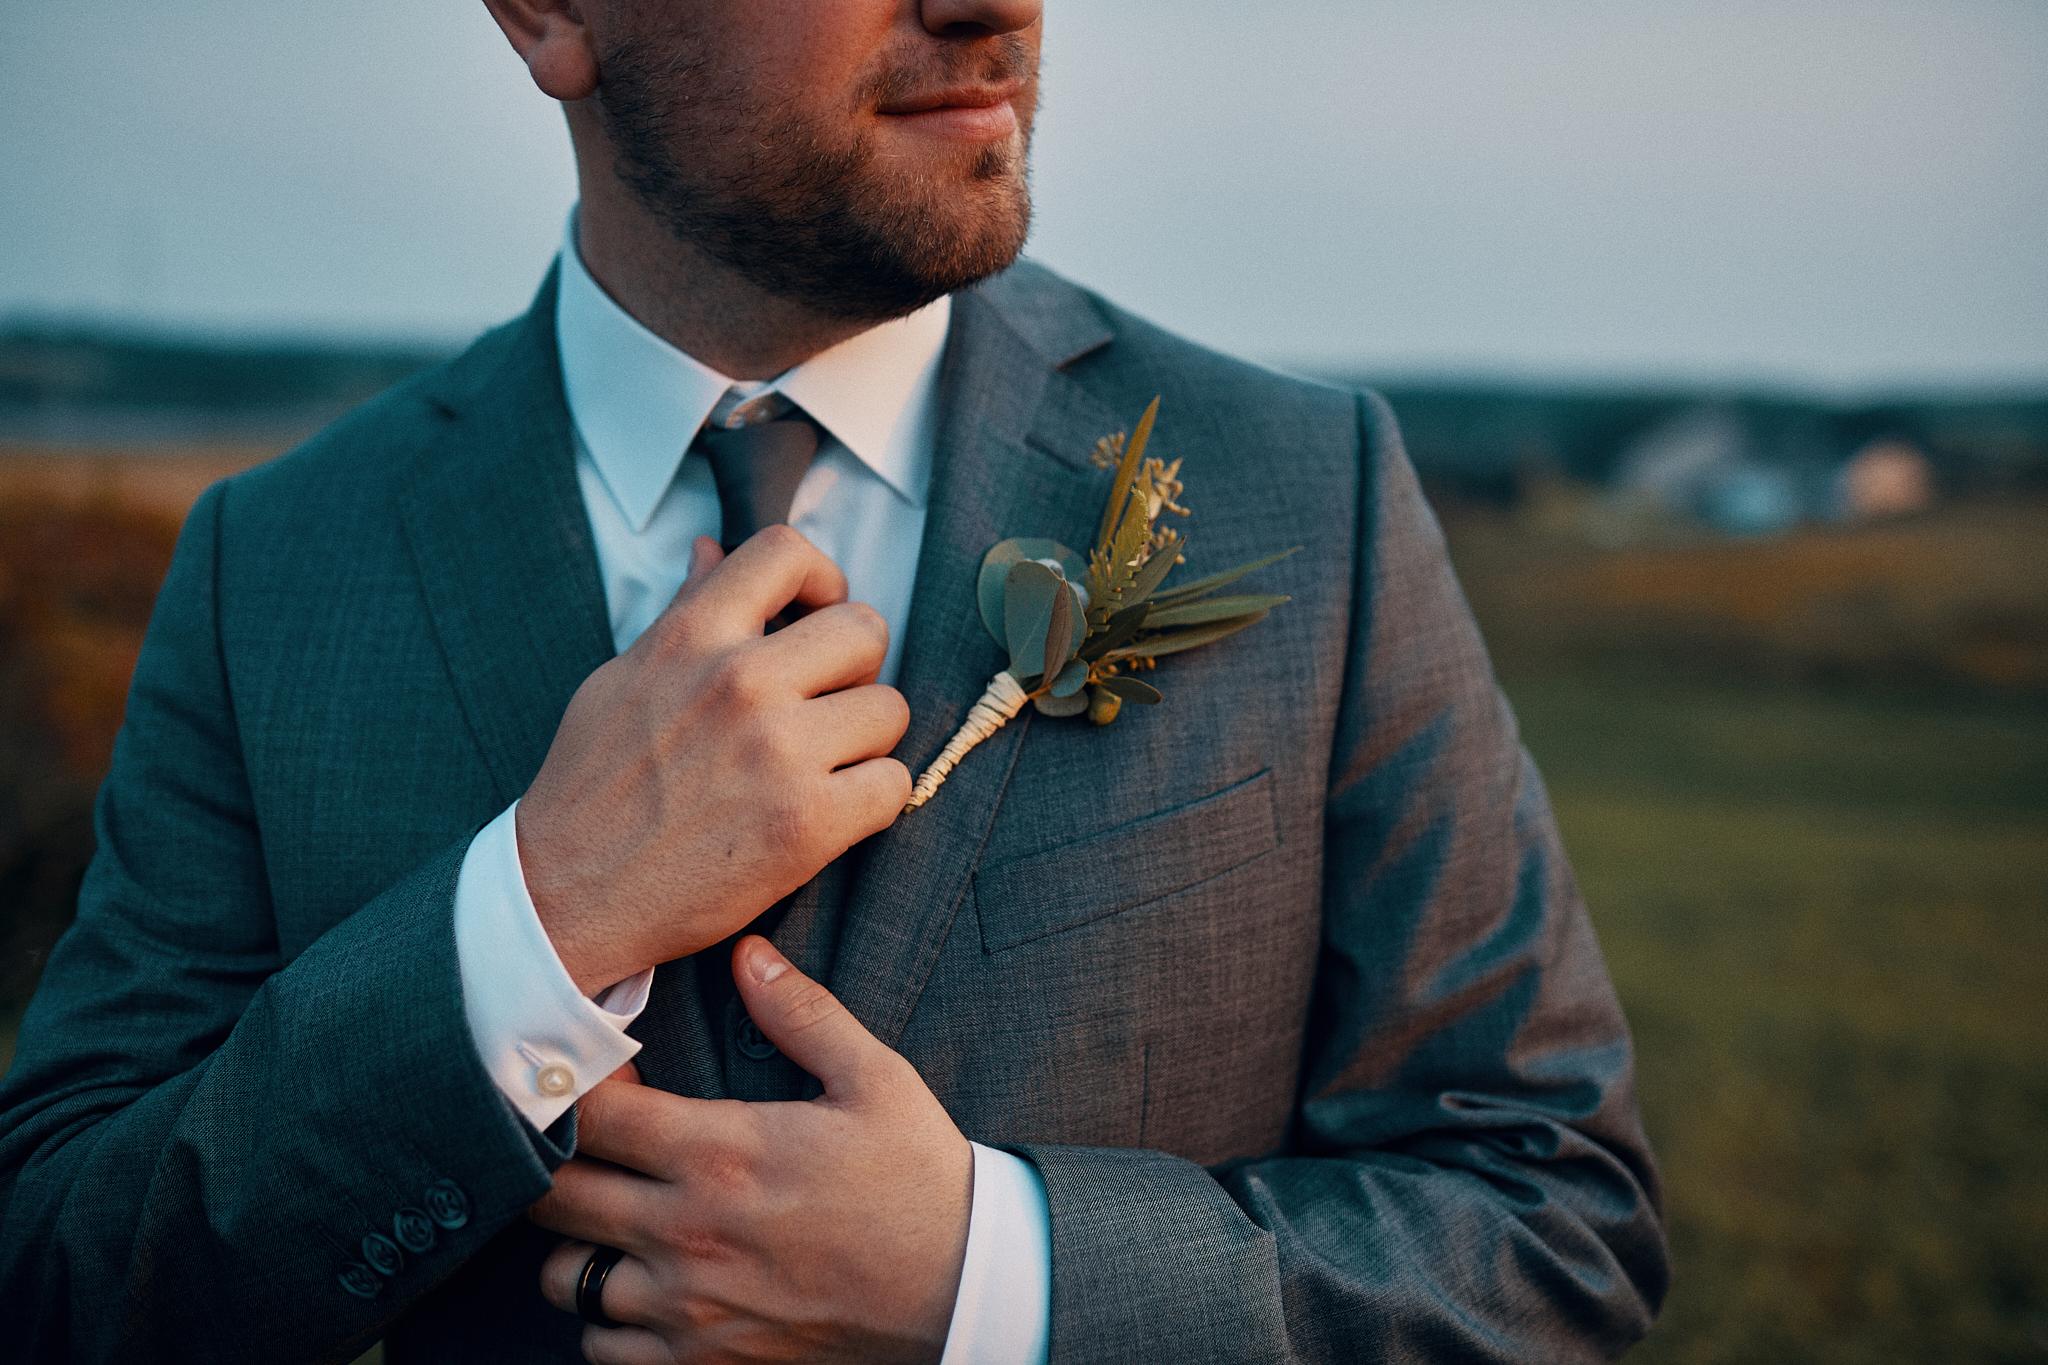 Killer_Field_Golden_Hour_Shot_In_Alexandria_Wedding_Photography_High_End_Minneapolis_Brand_Photographer_Something_Candid_028.JPG